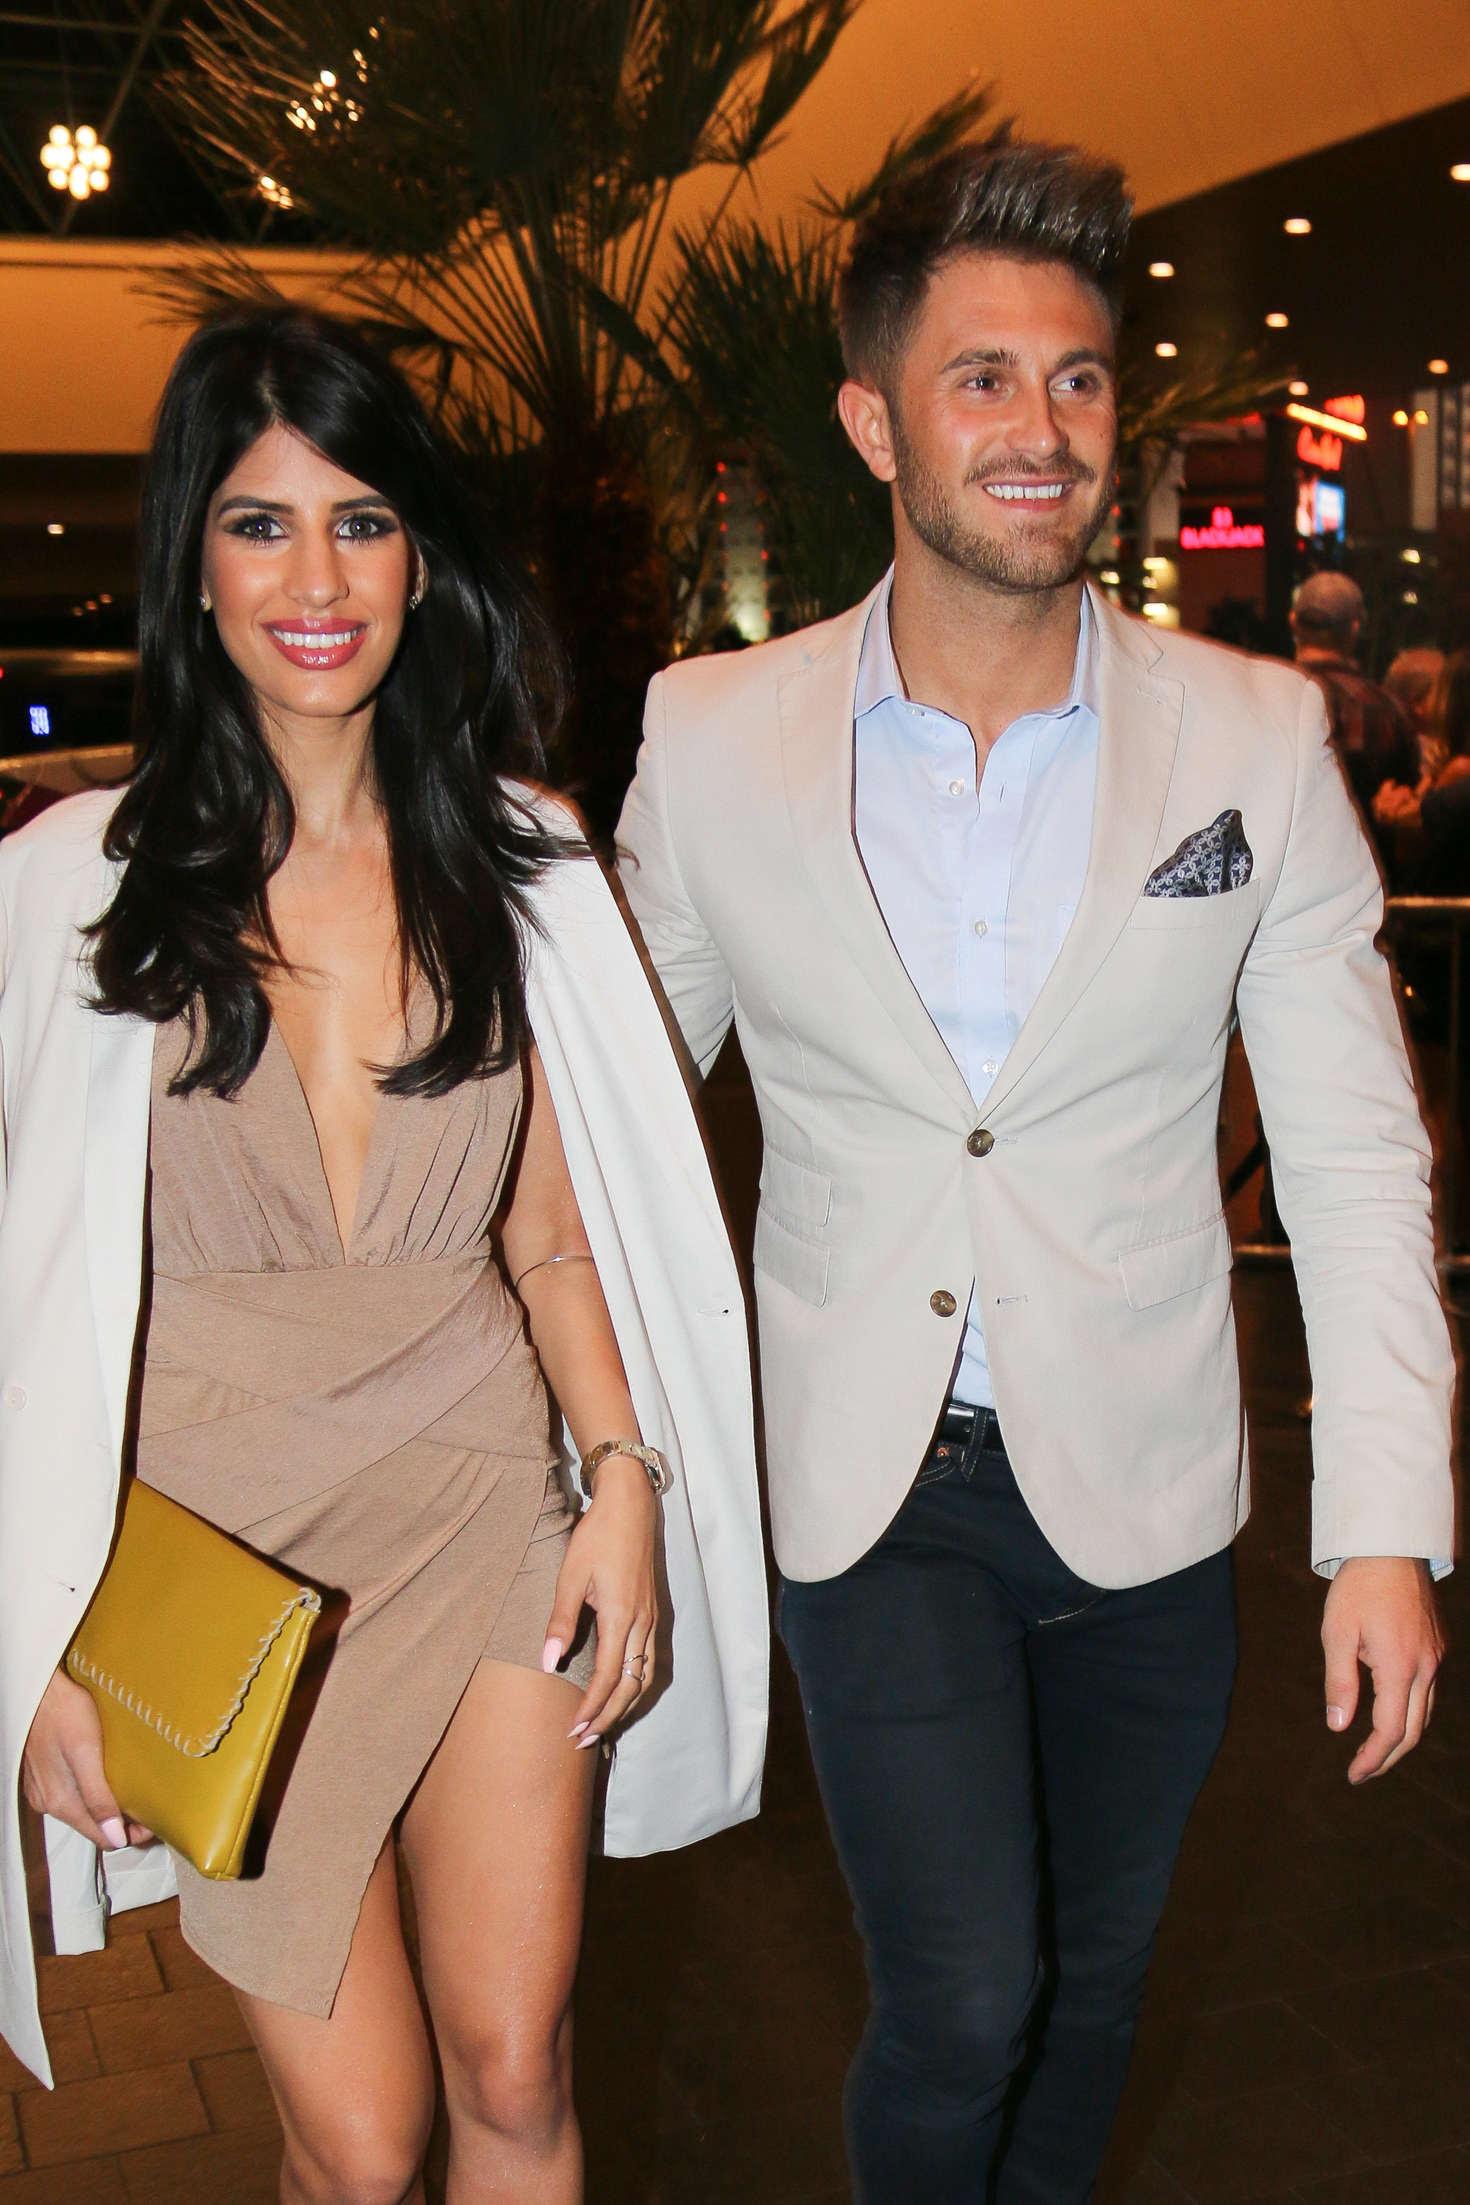 Jasmin Walia and her boyfriend Ross Worswick out in Las Vegas